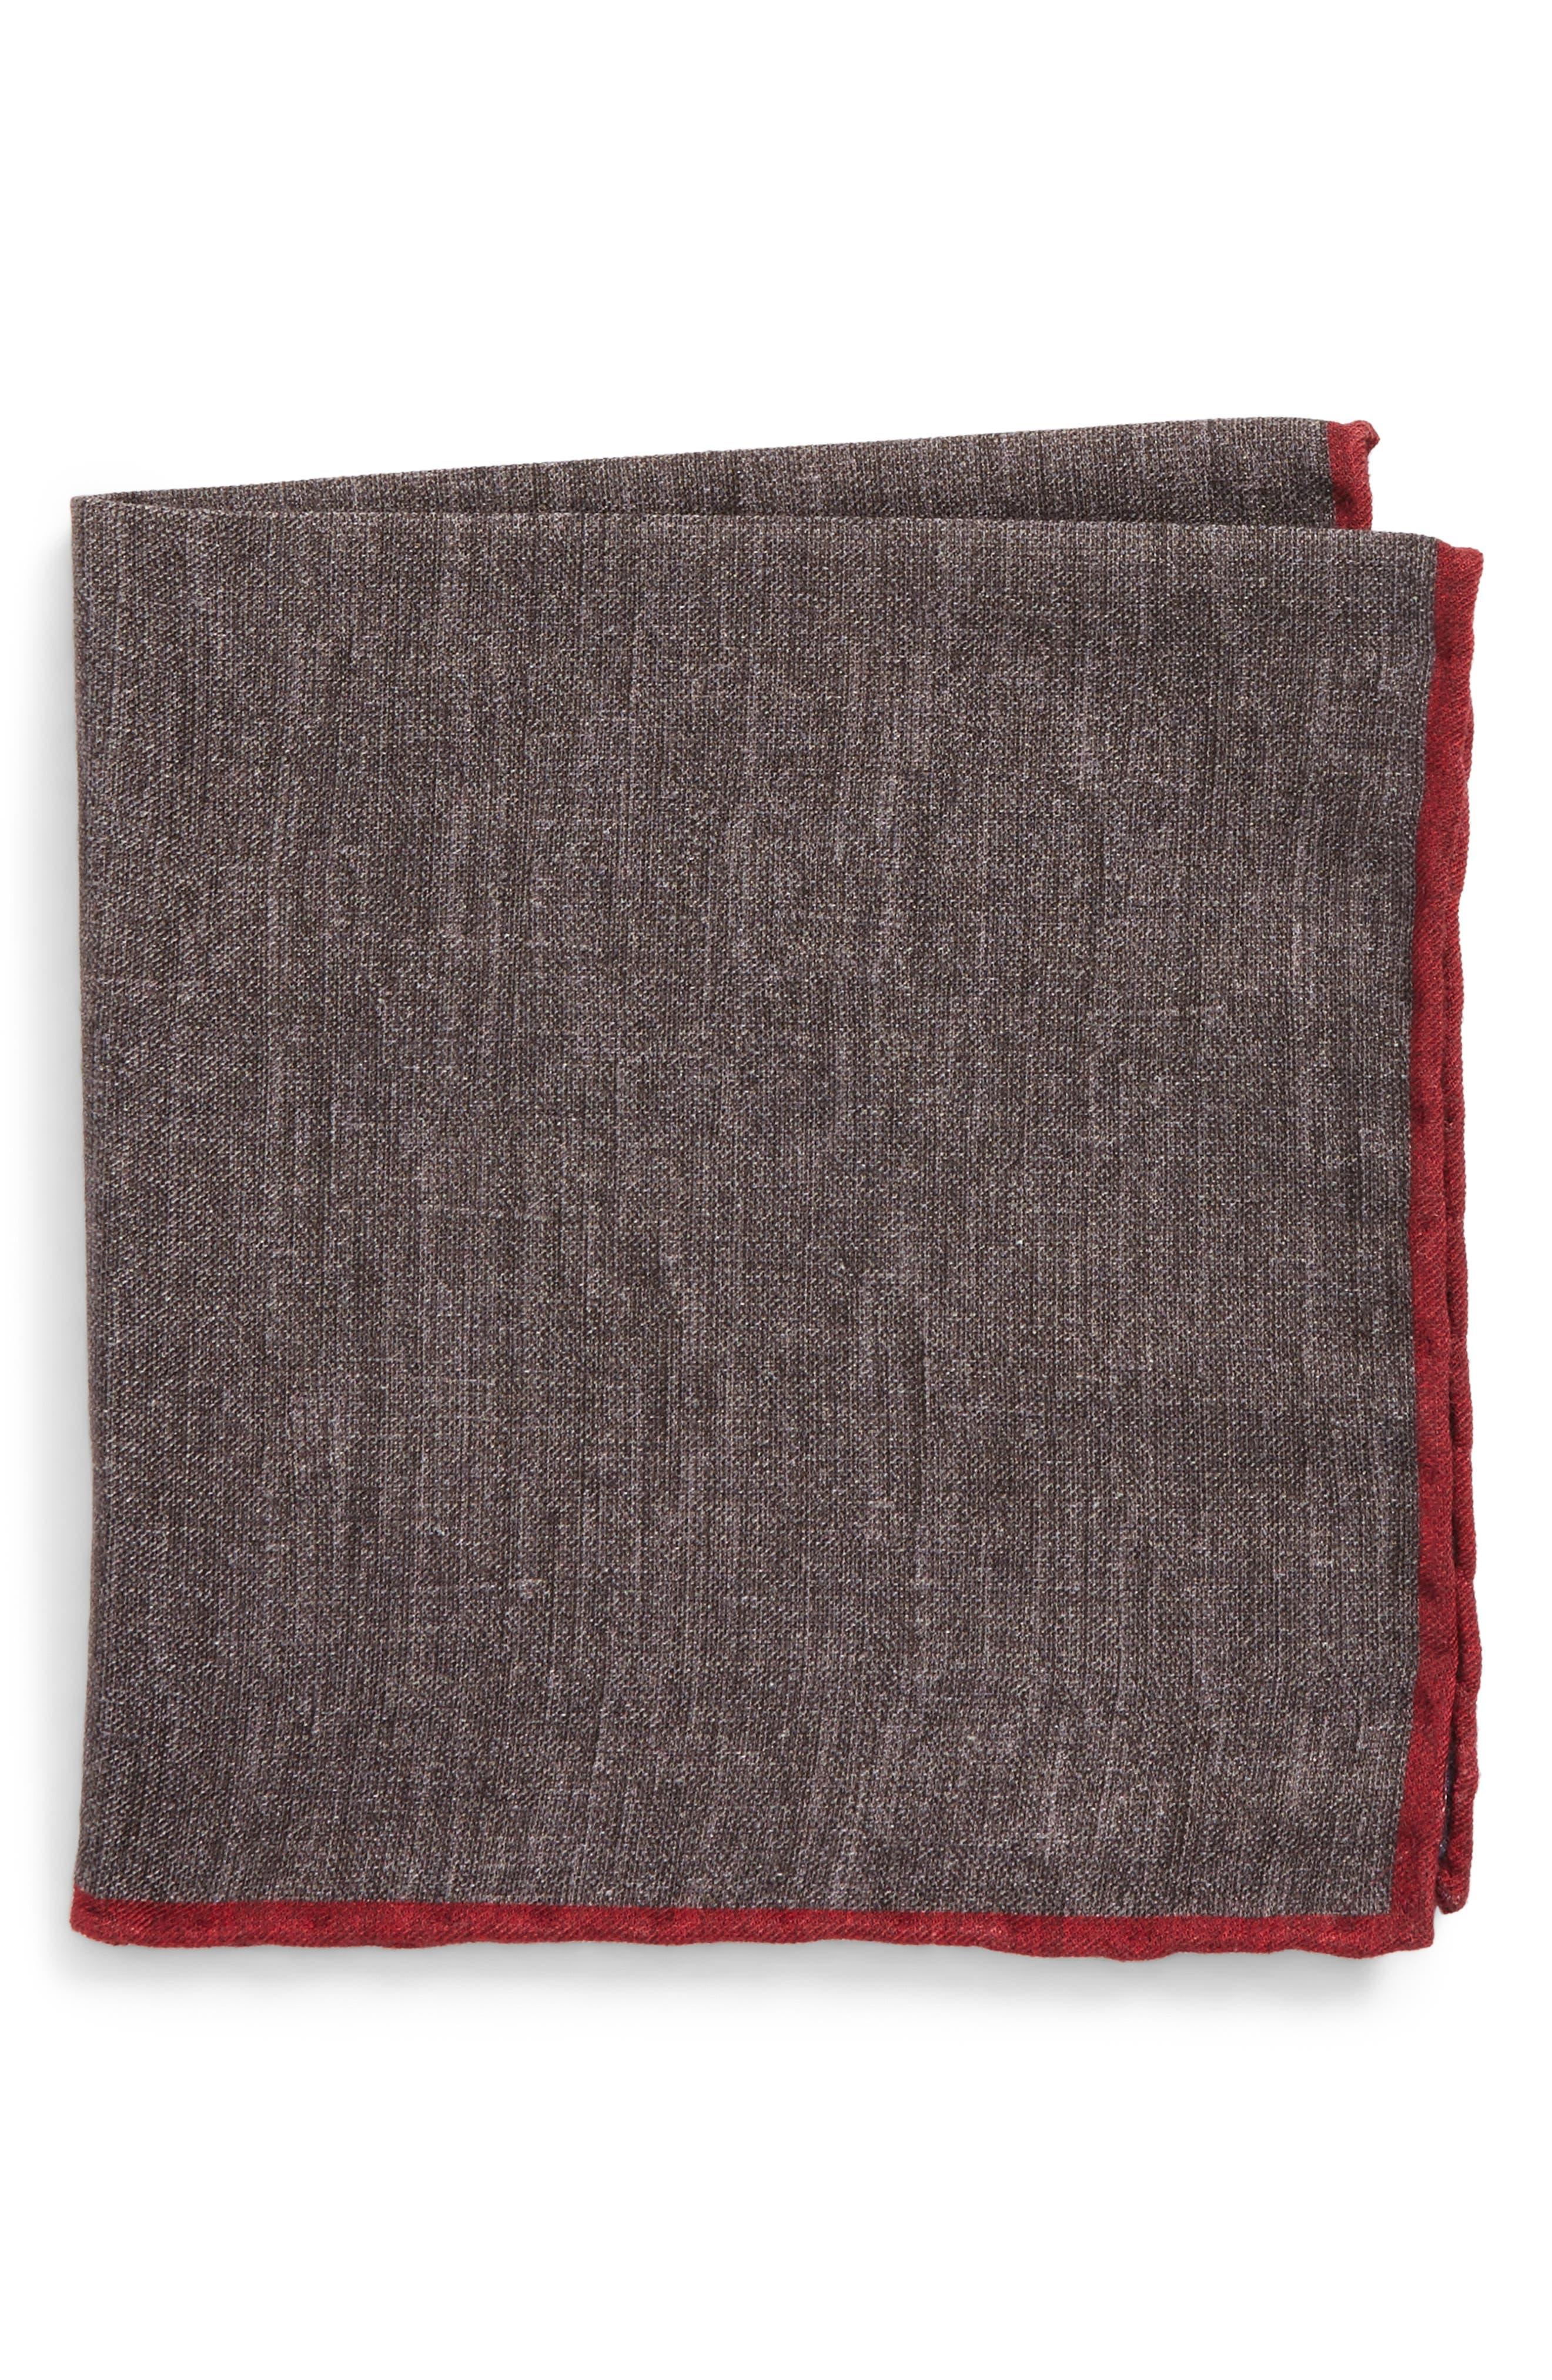 Main Image - Eleventy Solid Wool & Cotton Pocket Square